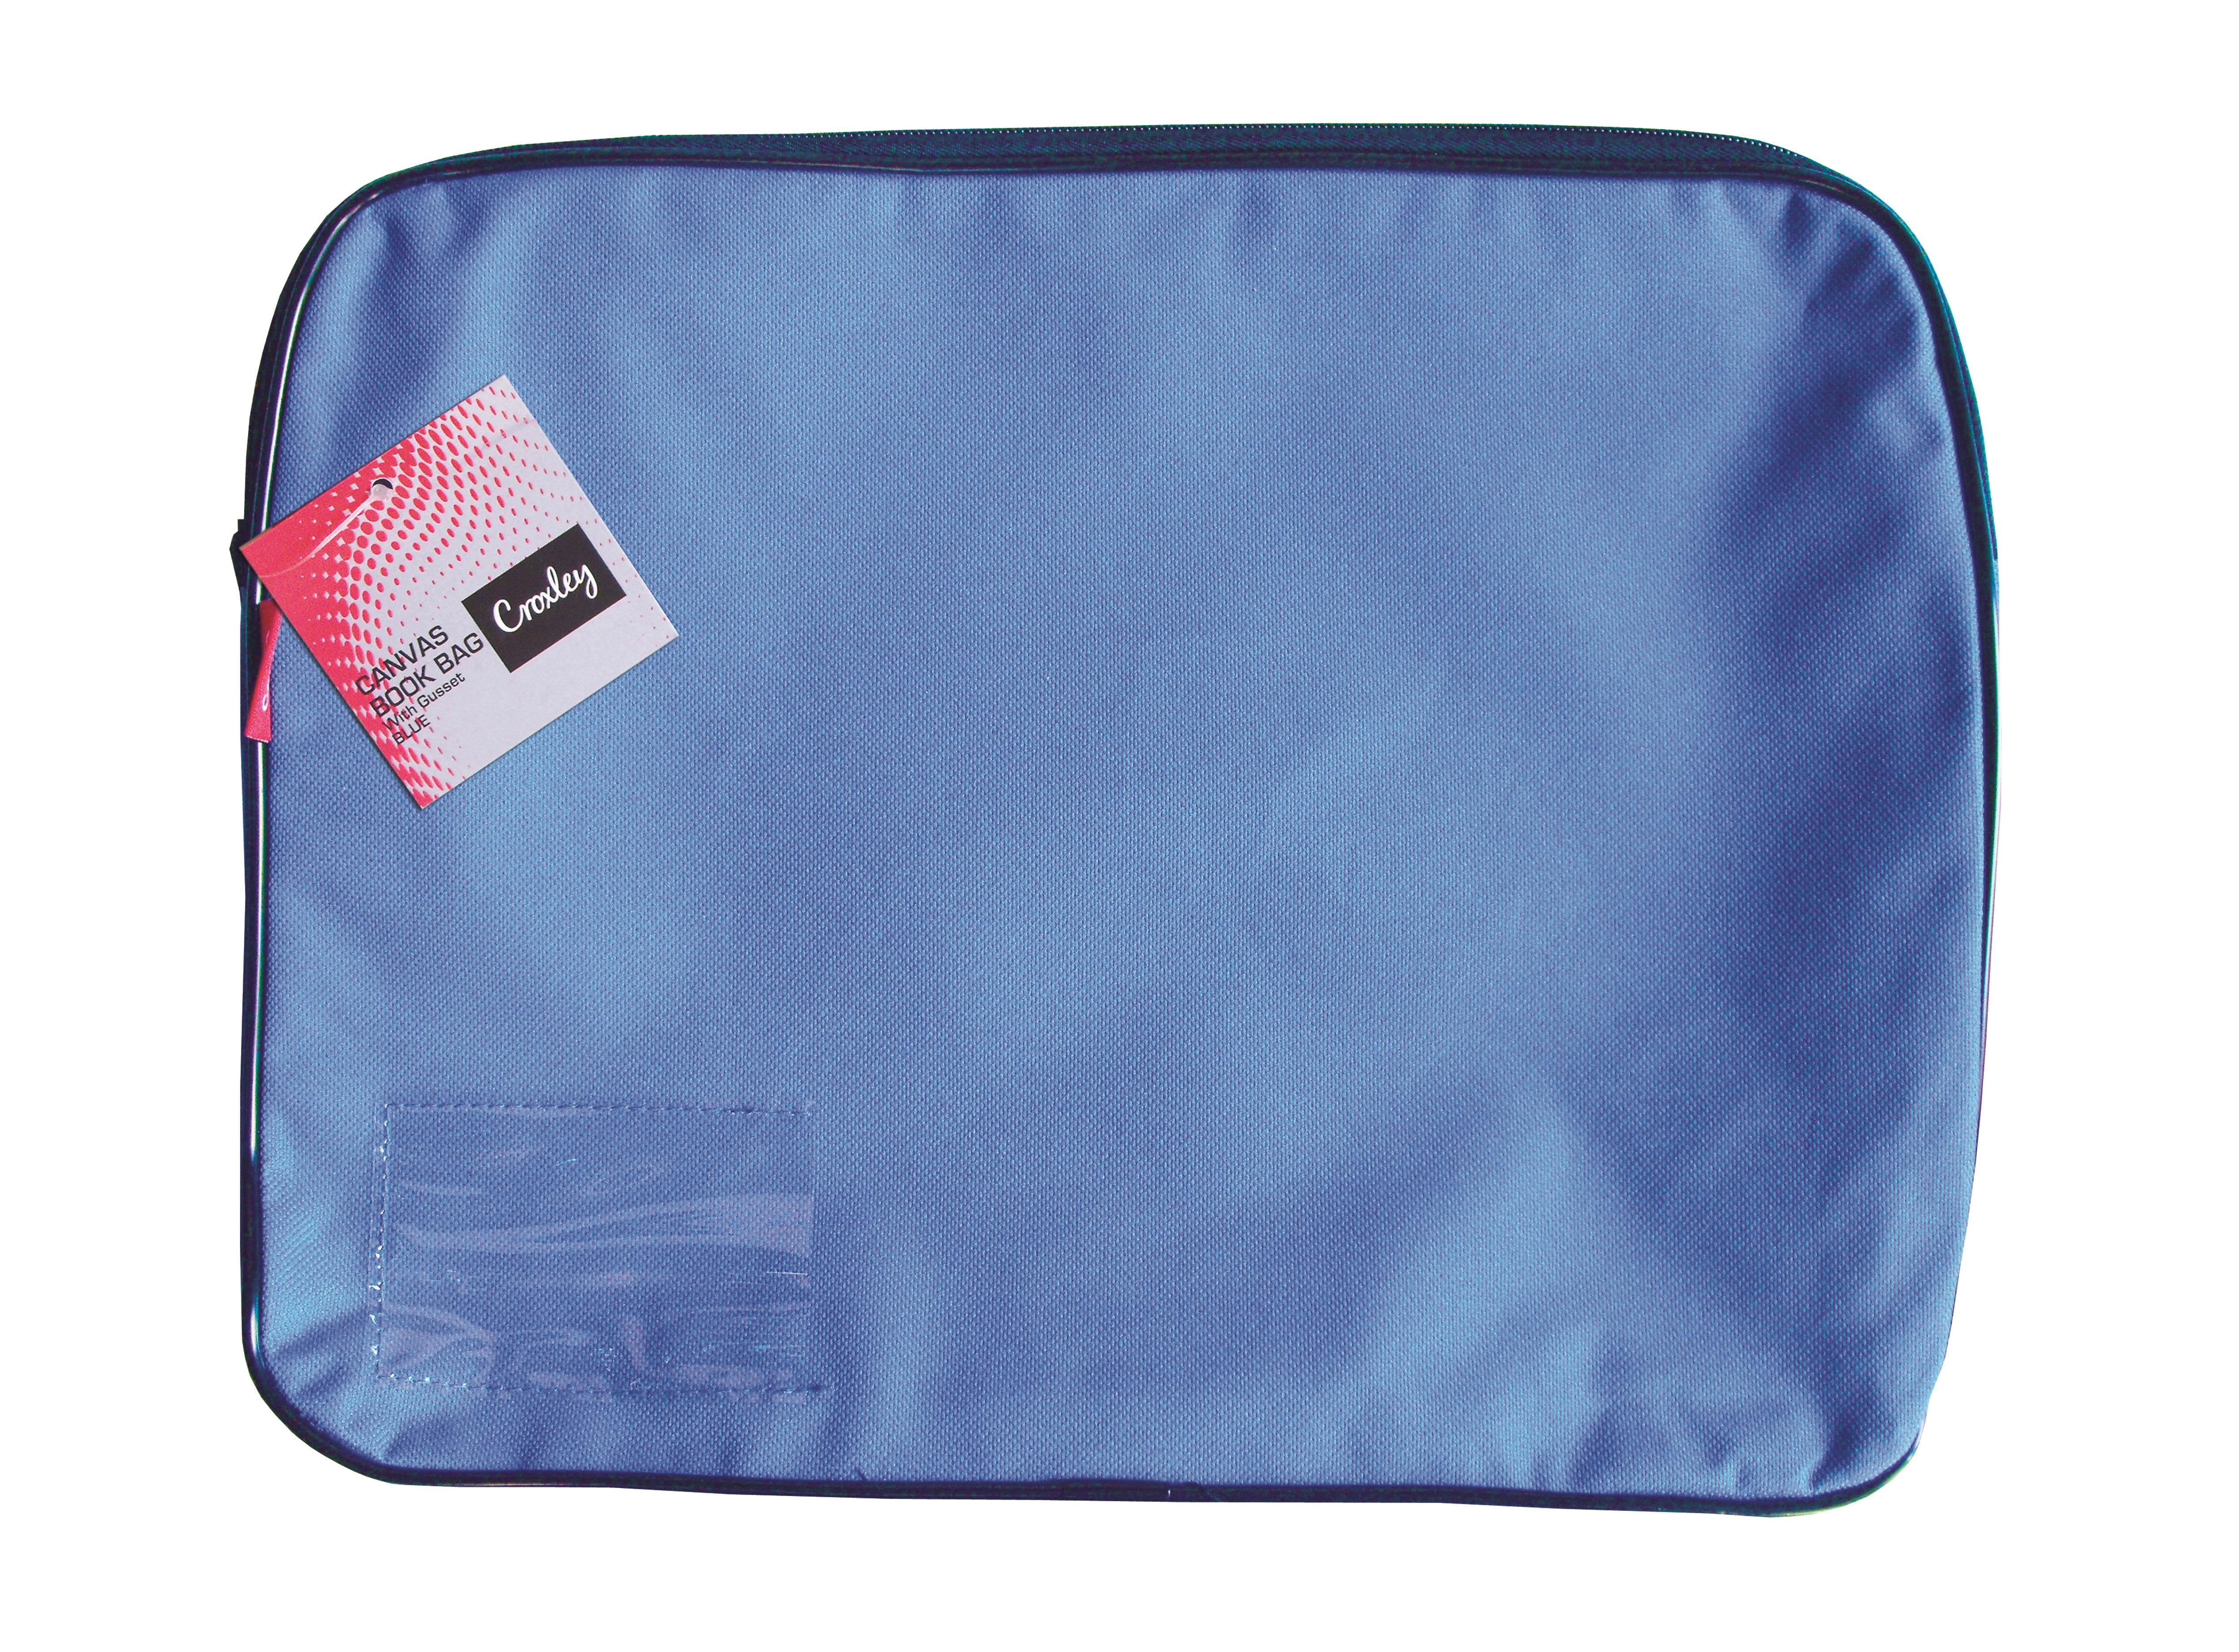 Croxley Canvas Gusset Book Bag Blue